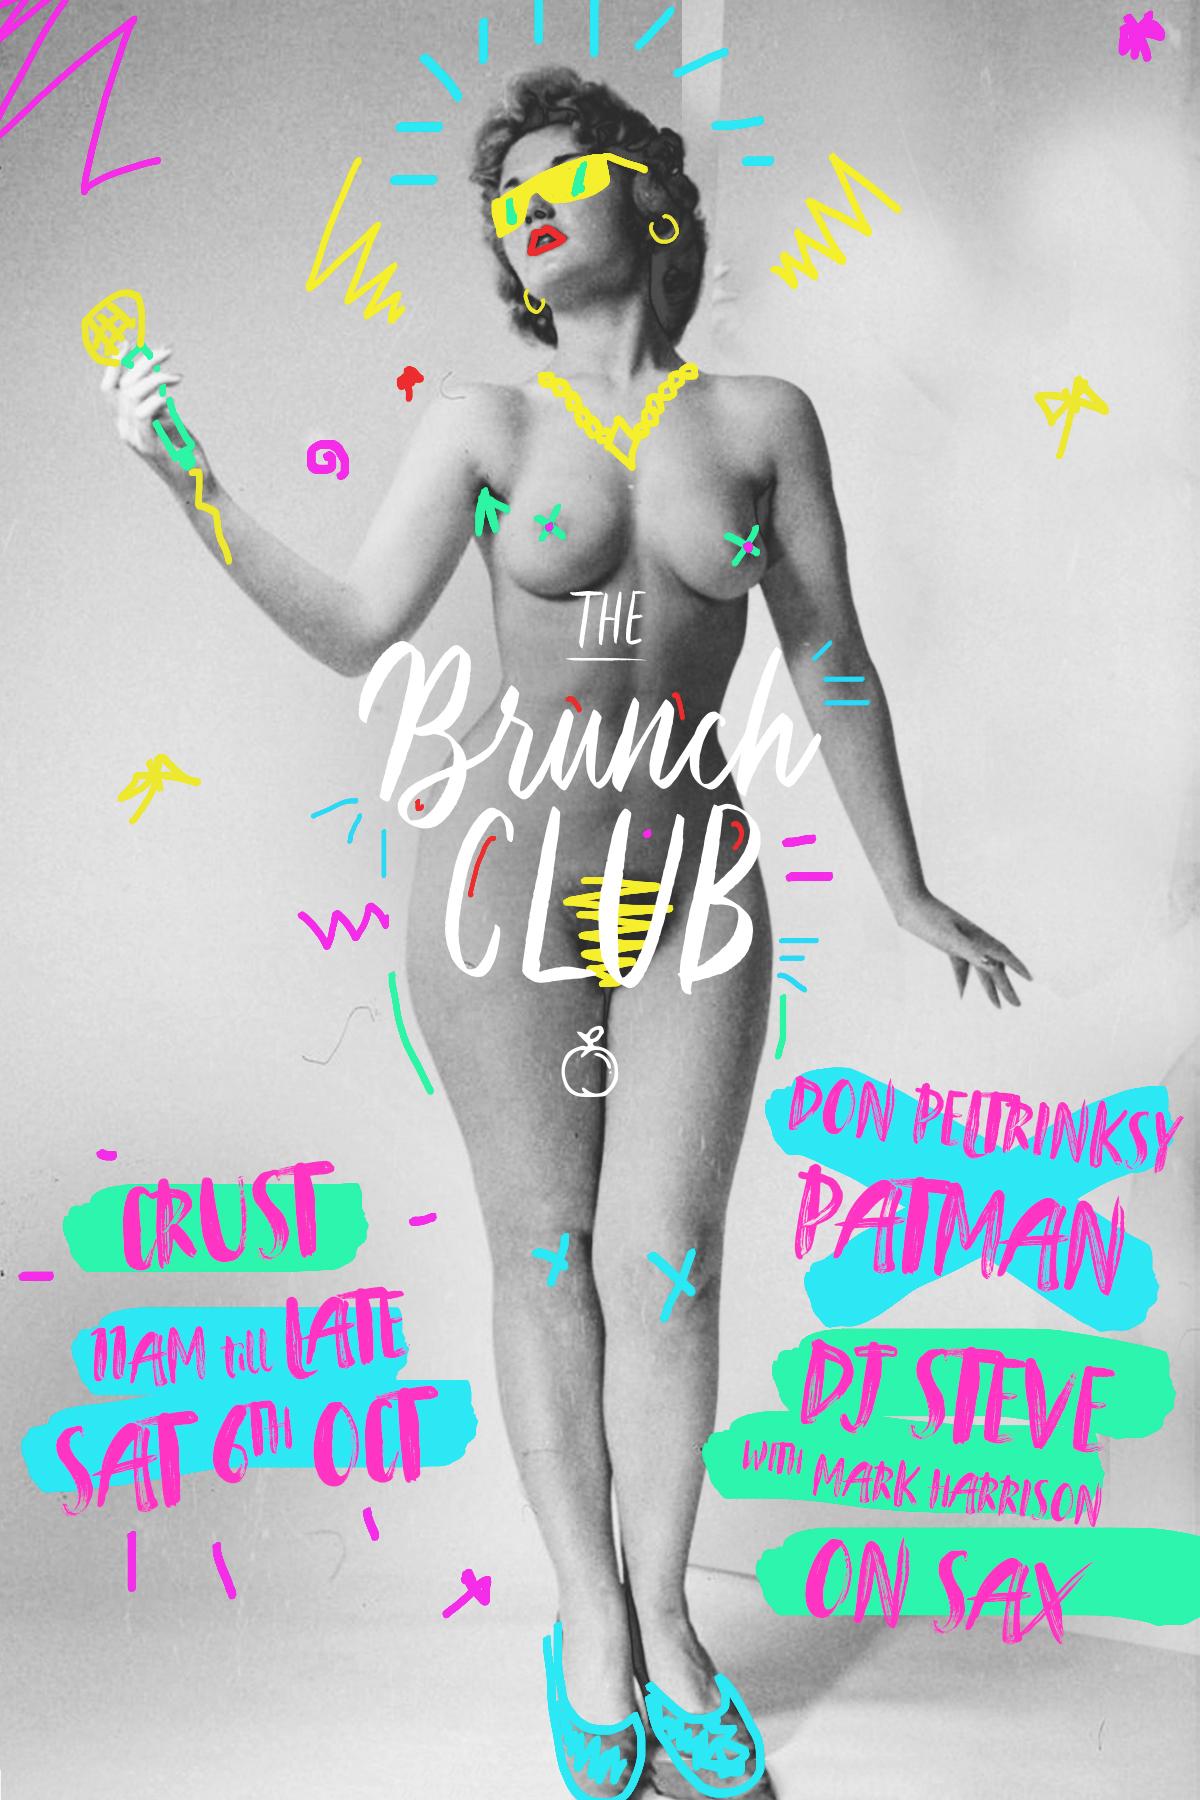 The Brunch Club - Post Brunch flyer